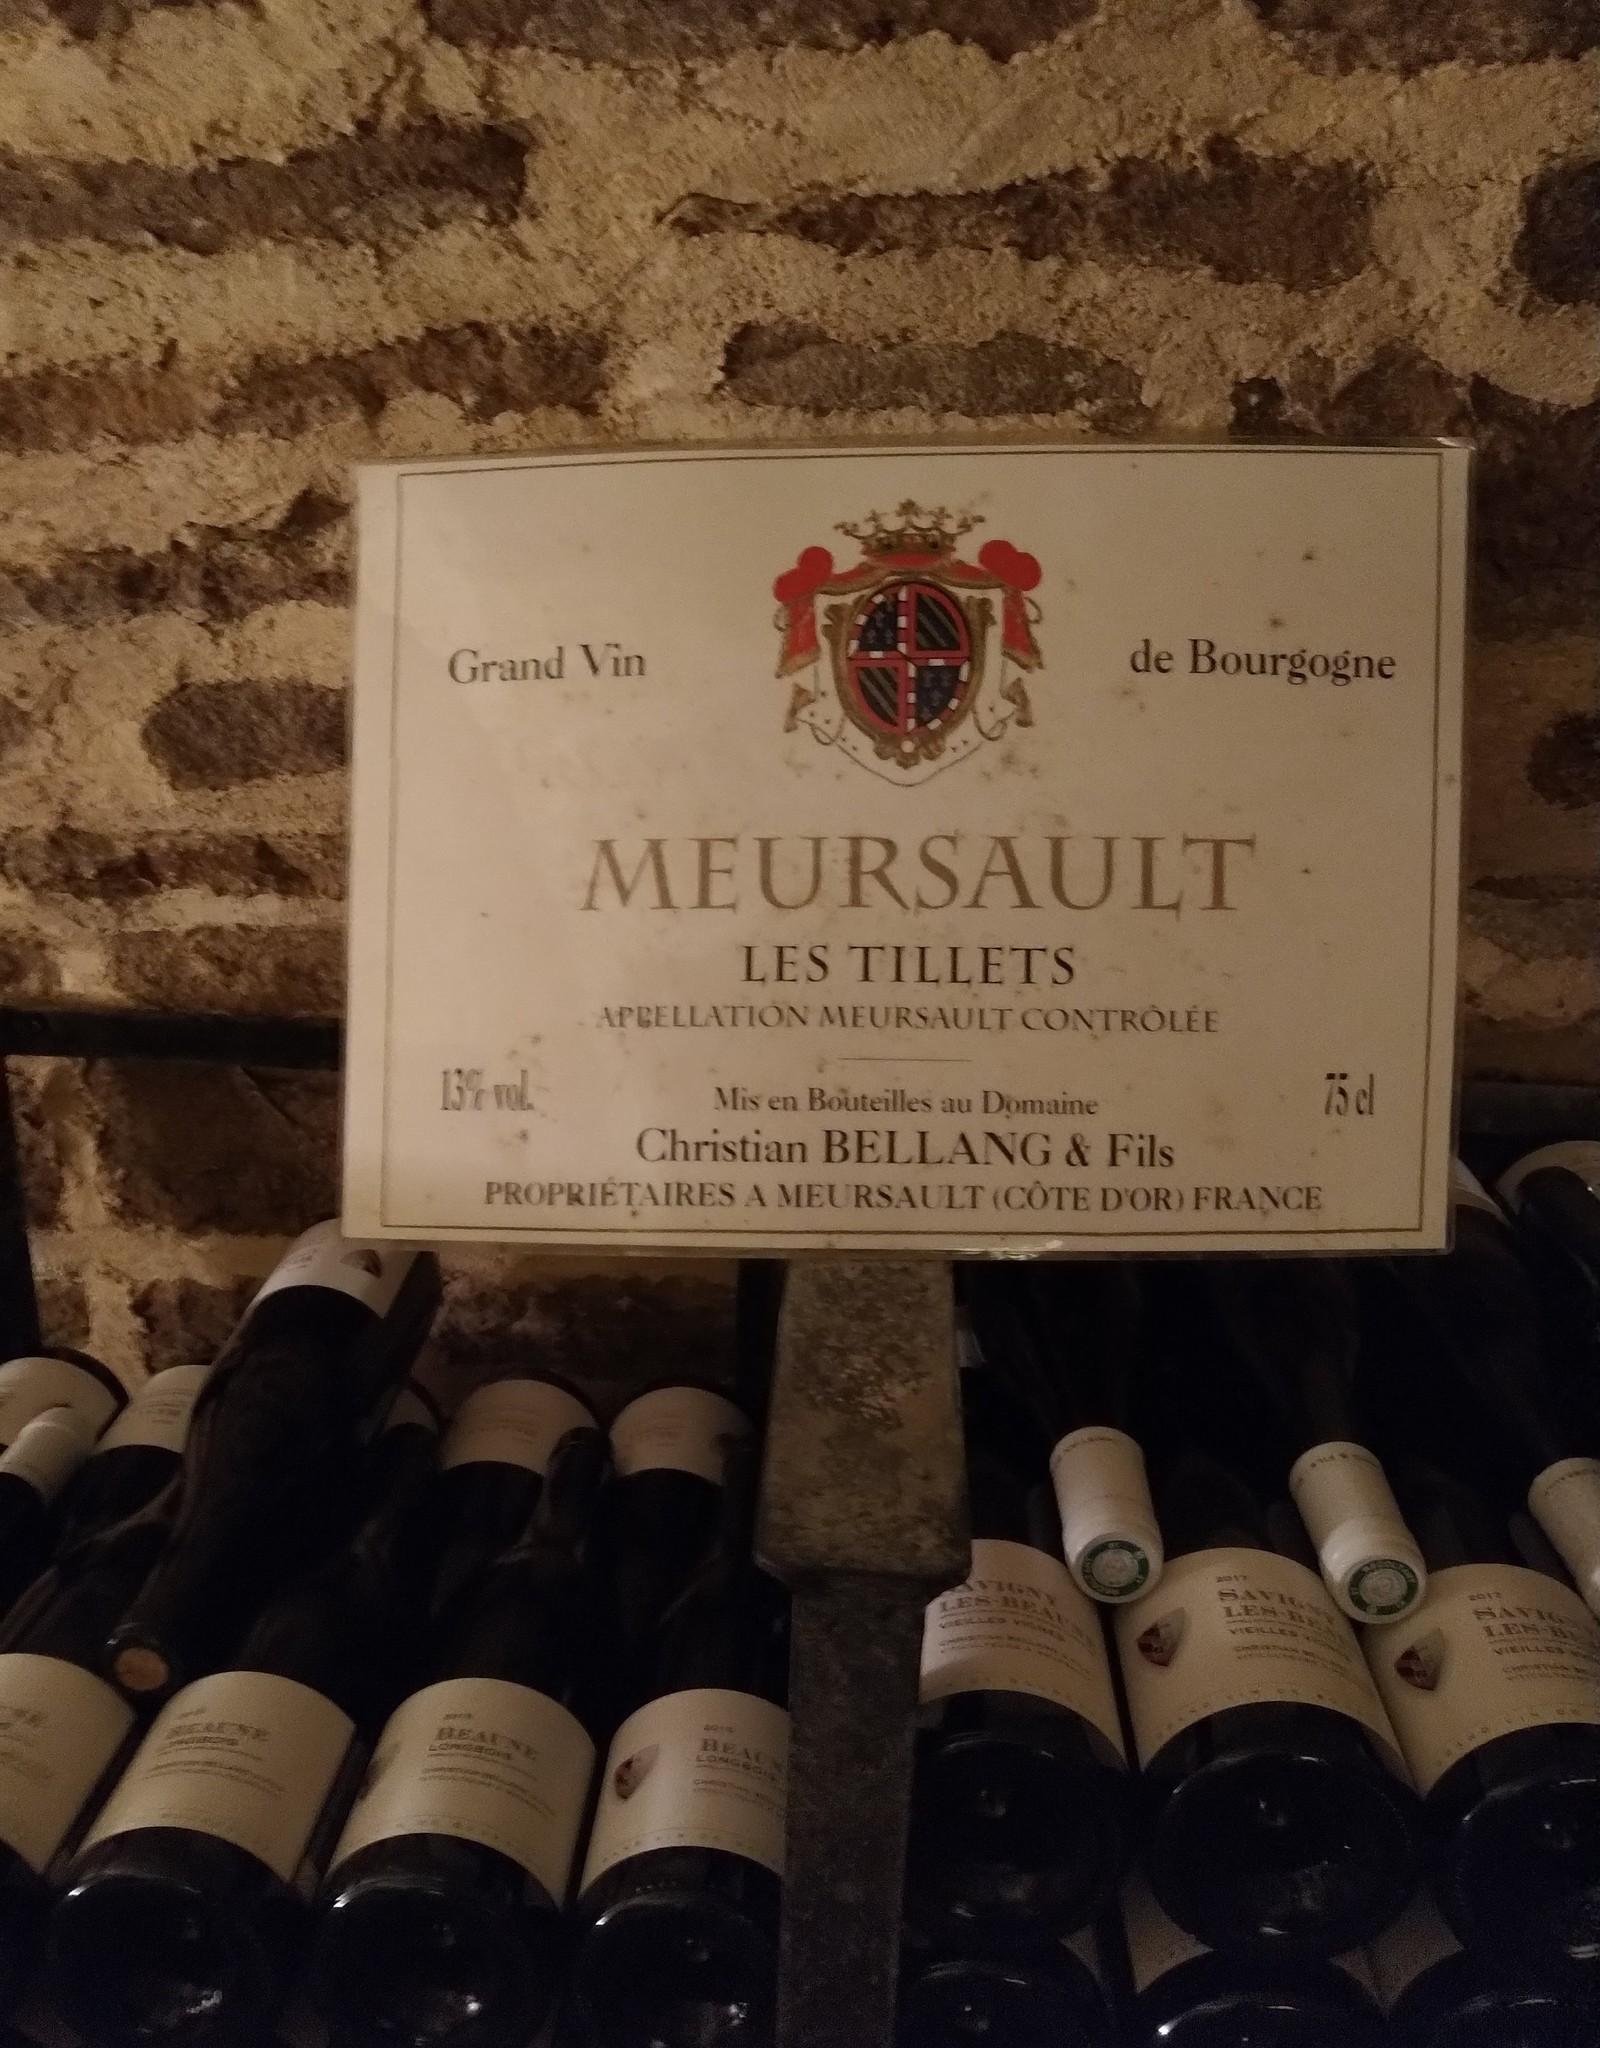 2017 Meursault Les Tillets, Christian Bellang